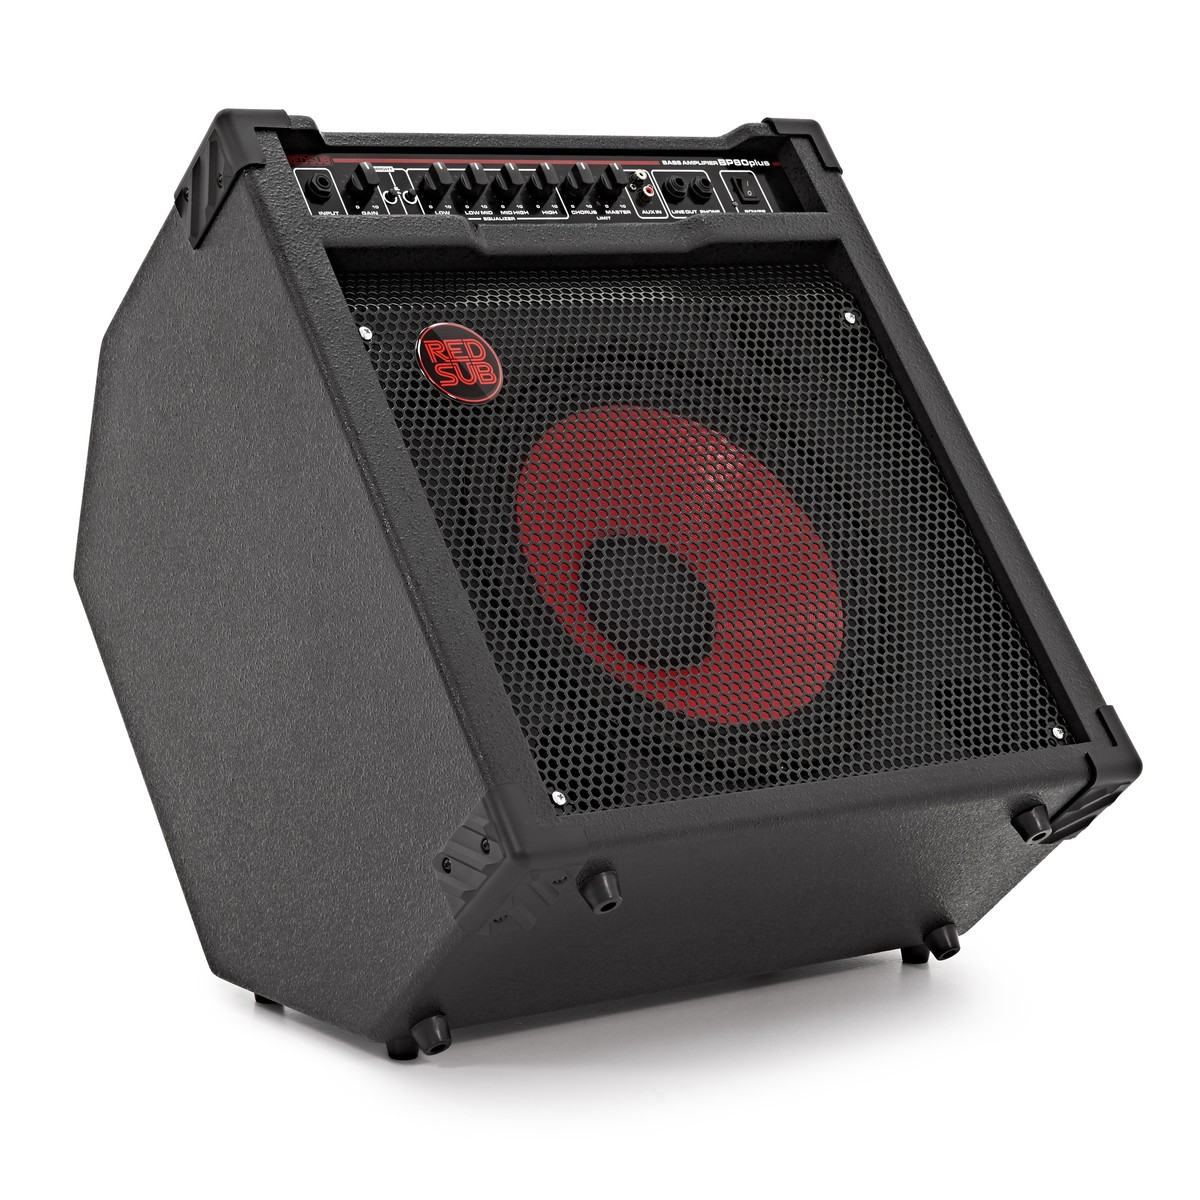 redsub bp80plus 80w bass guitar amplifier at gear4music. Black Bedroom Furniture Sets. Home Design Ideas